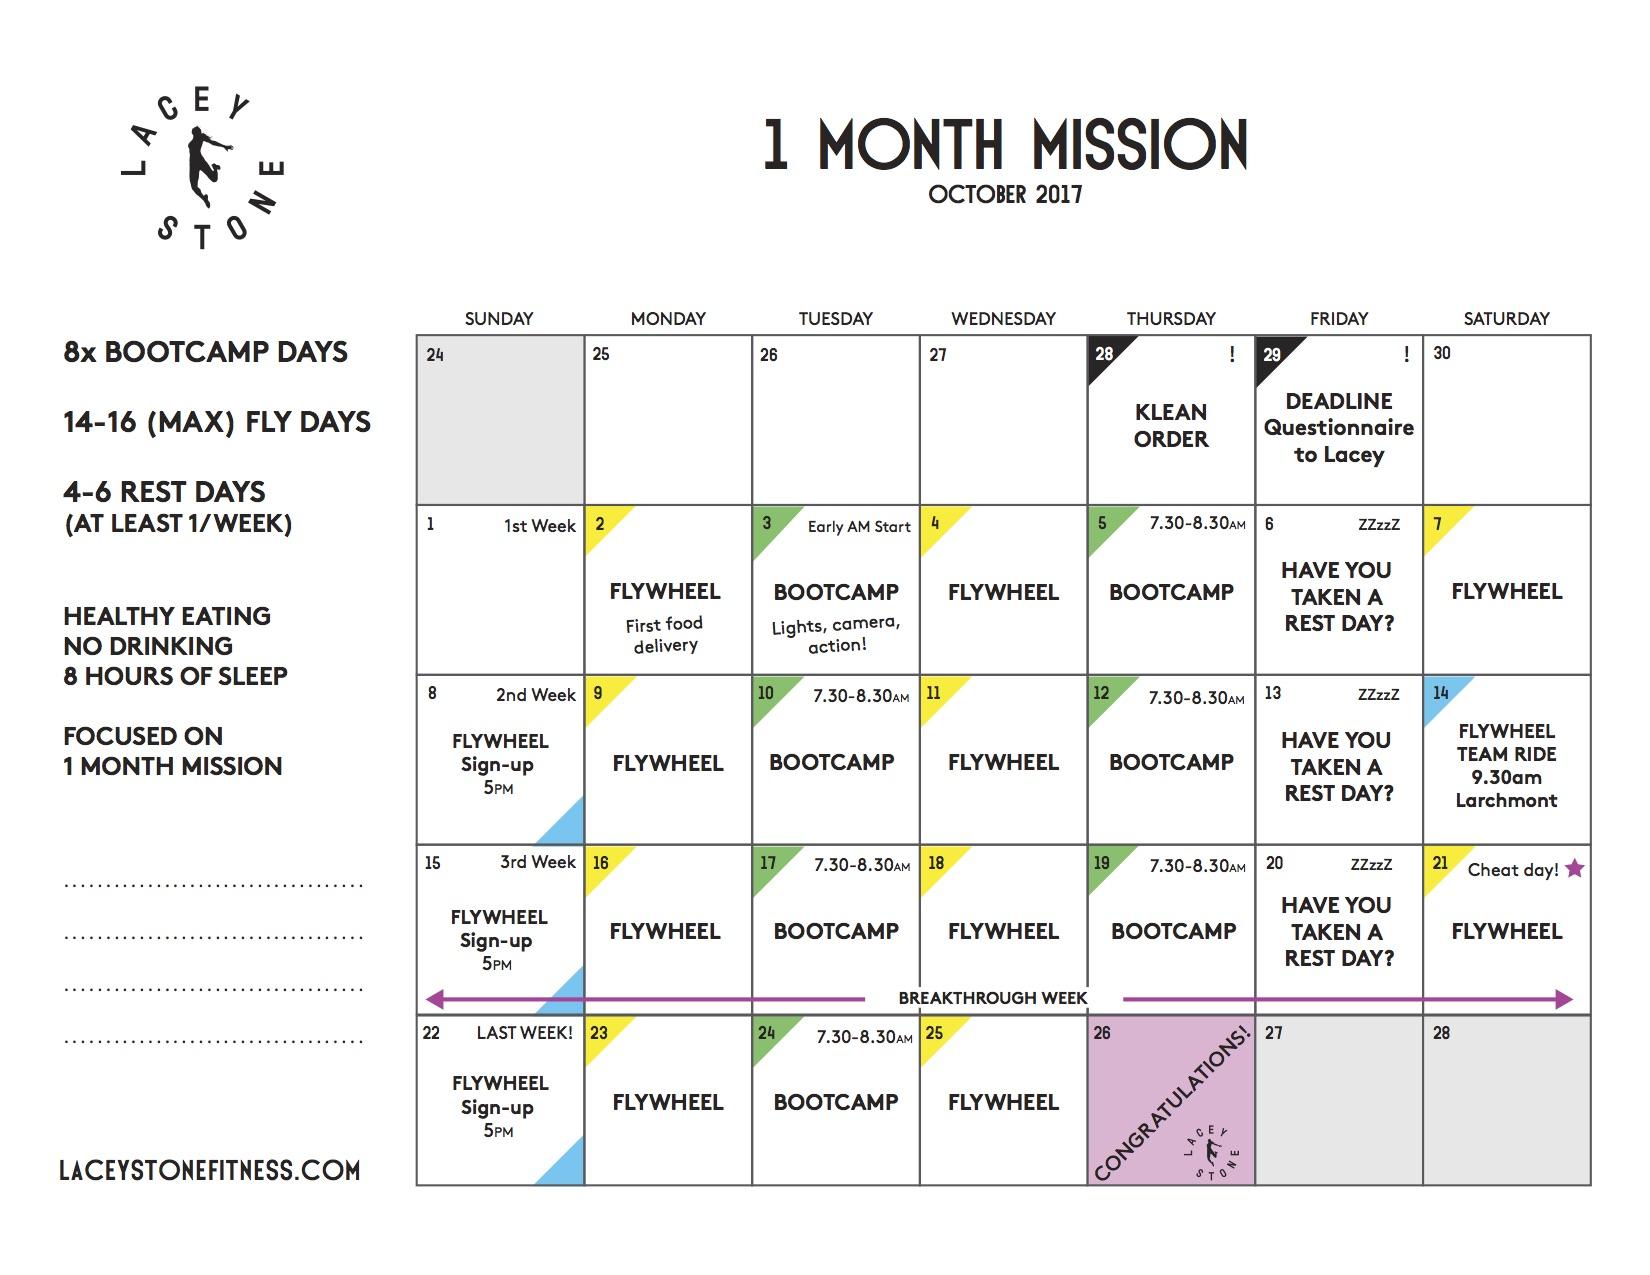 LaceyStone_Calendar_1month_0917_V2 copy